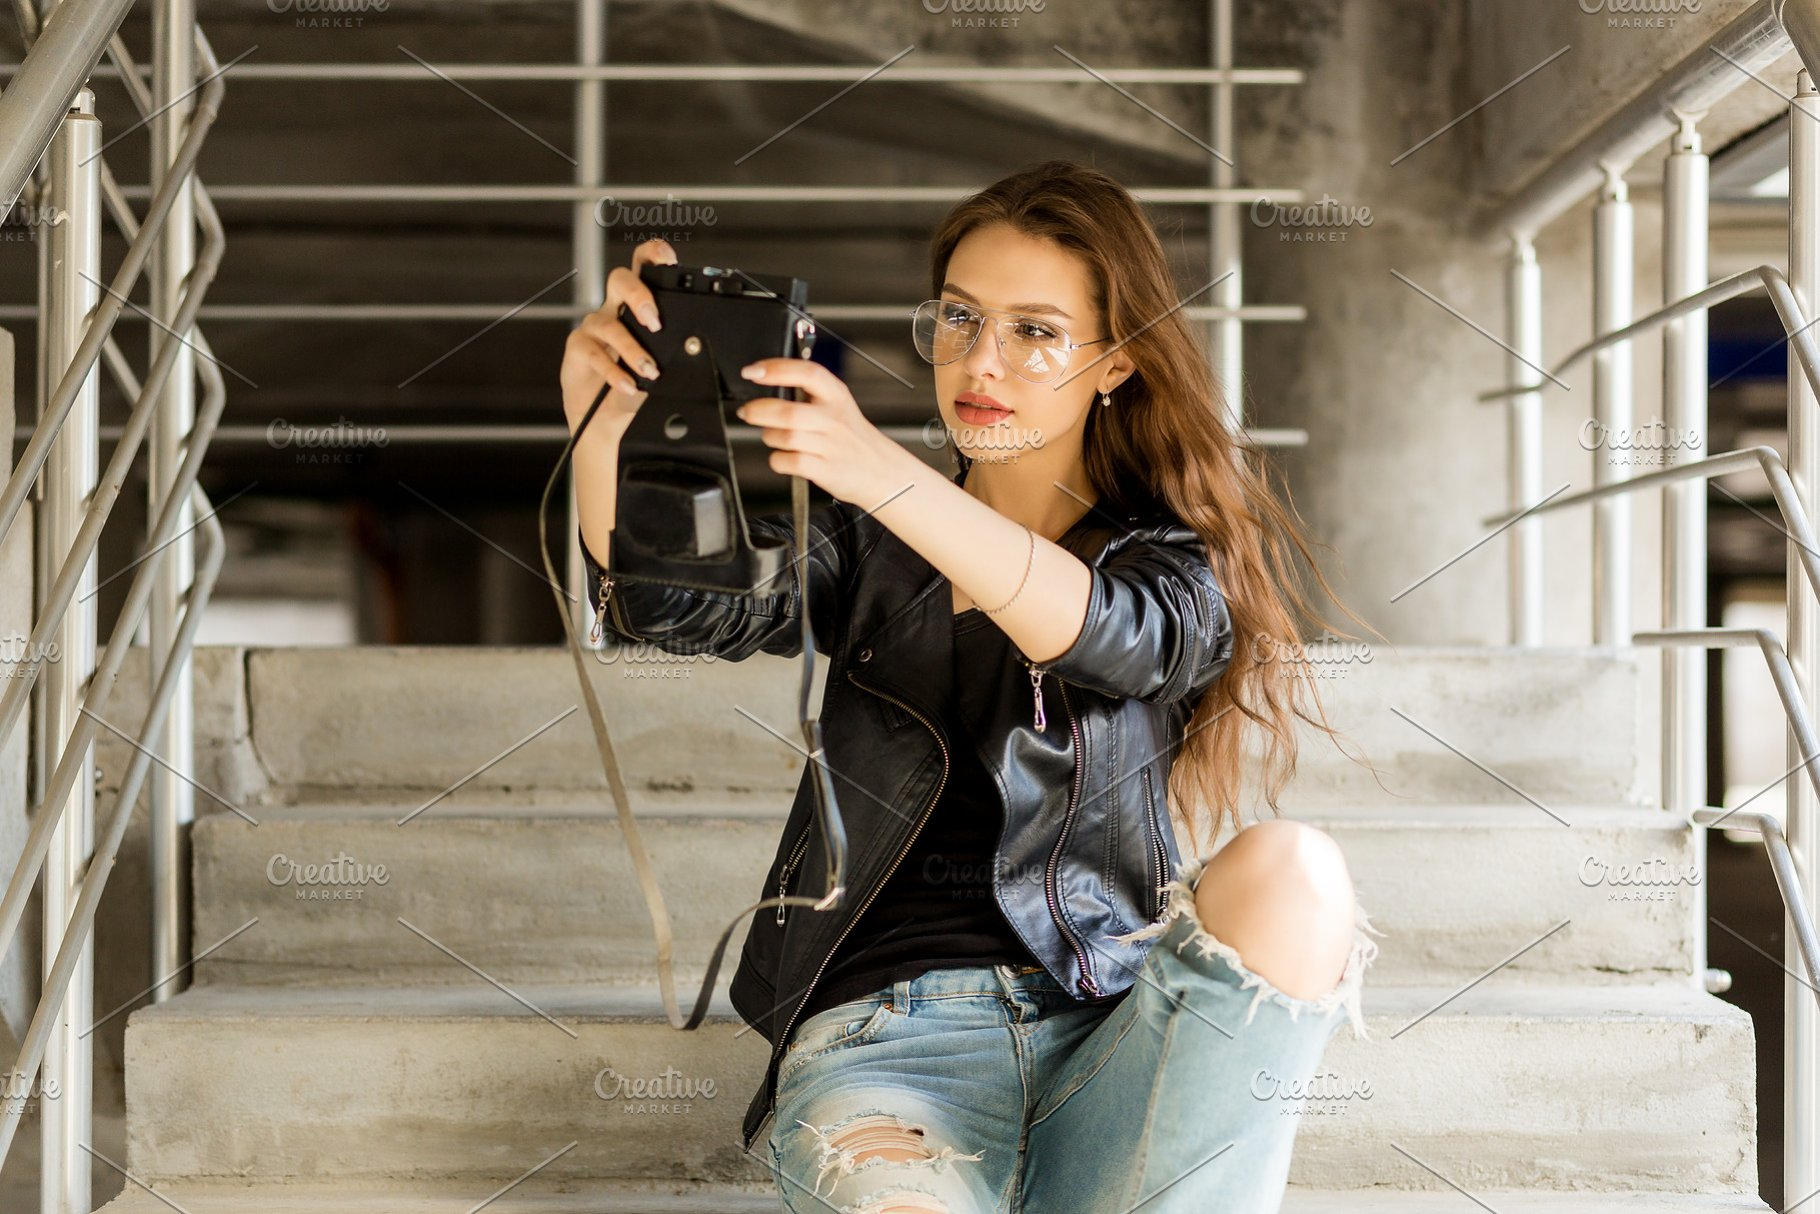 Fashion Urban Style Hipster Girl Beauty Fashion Photos